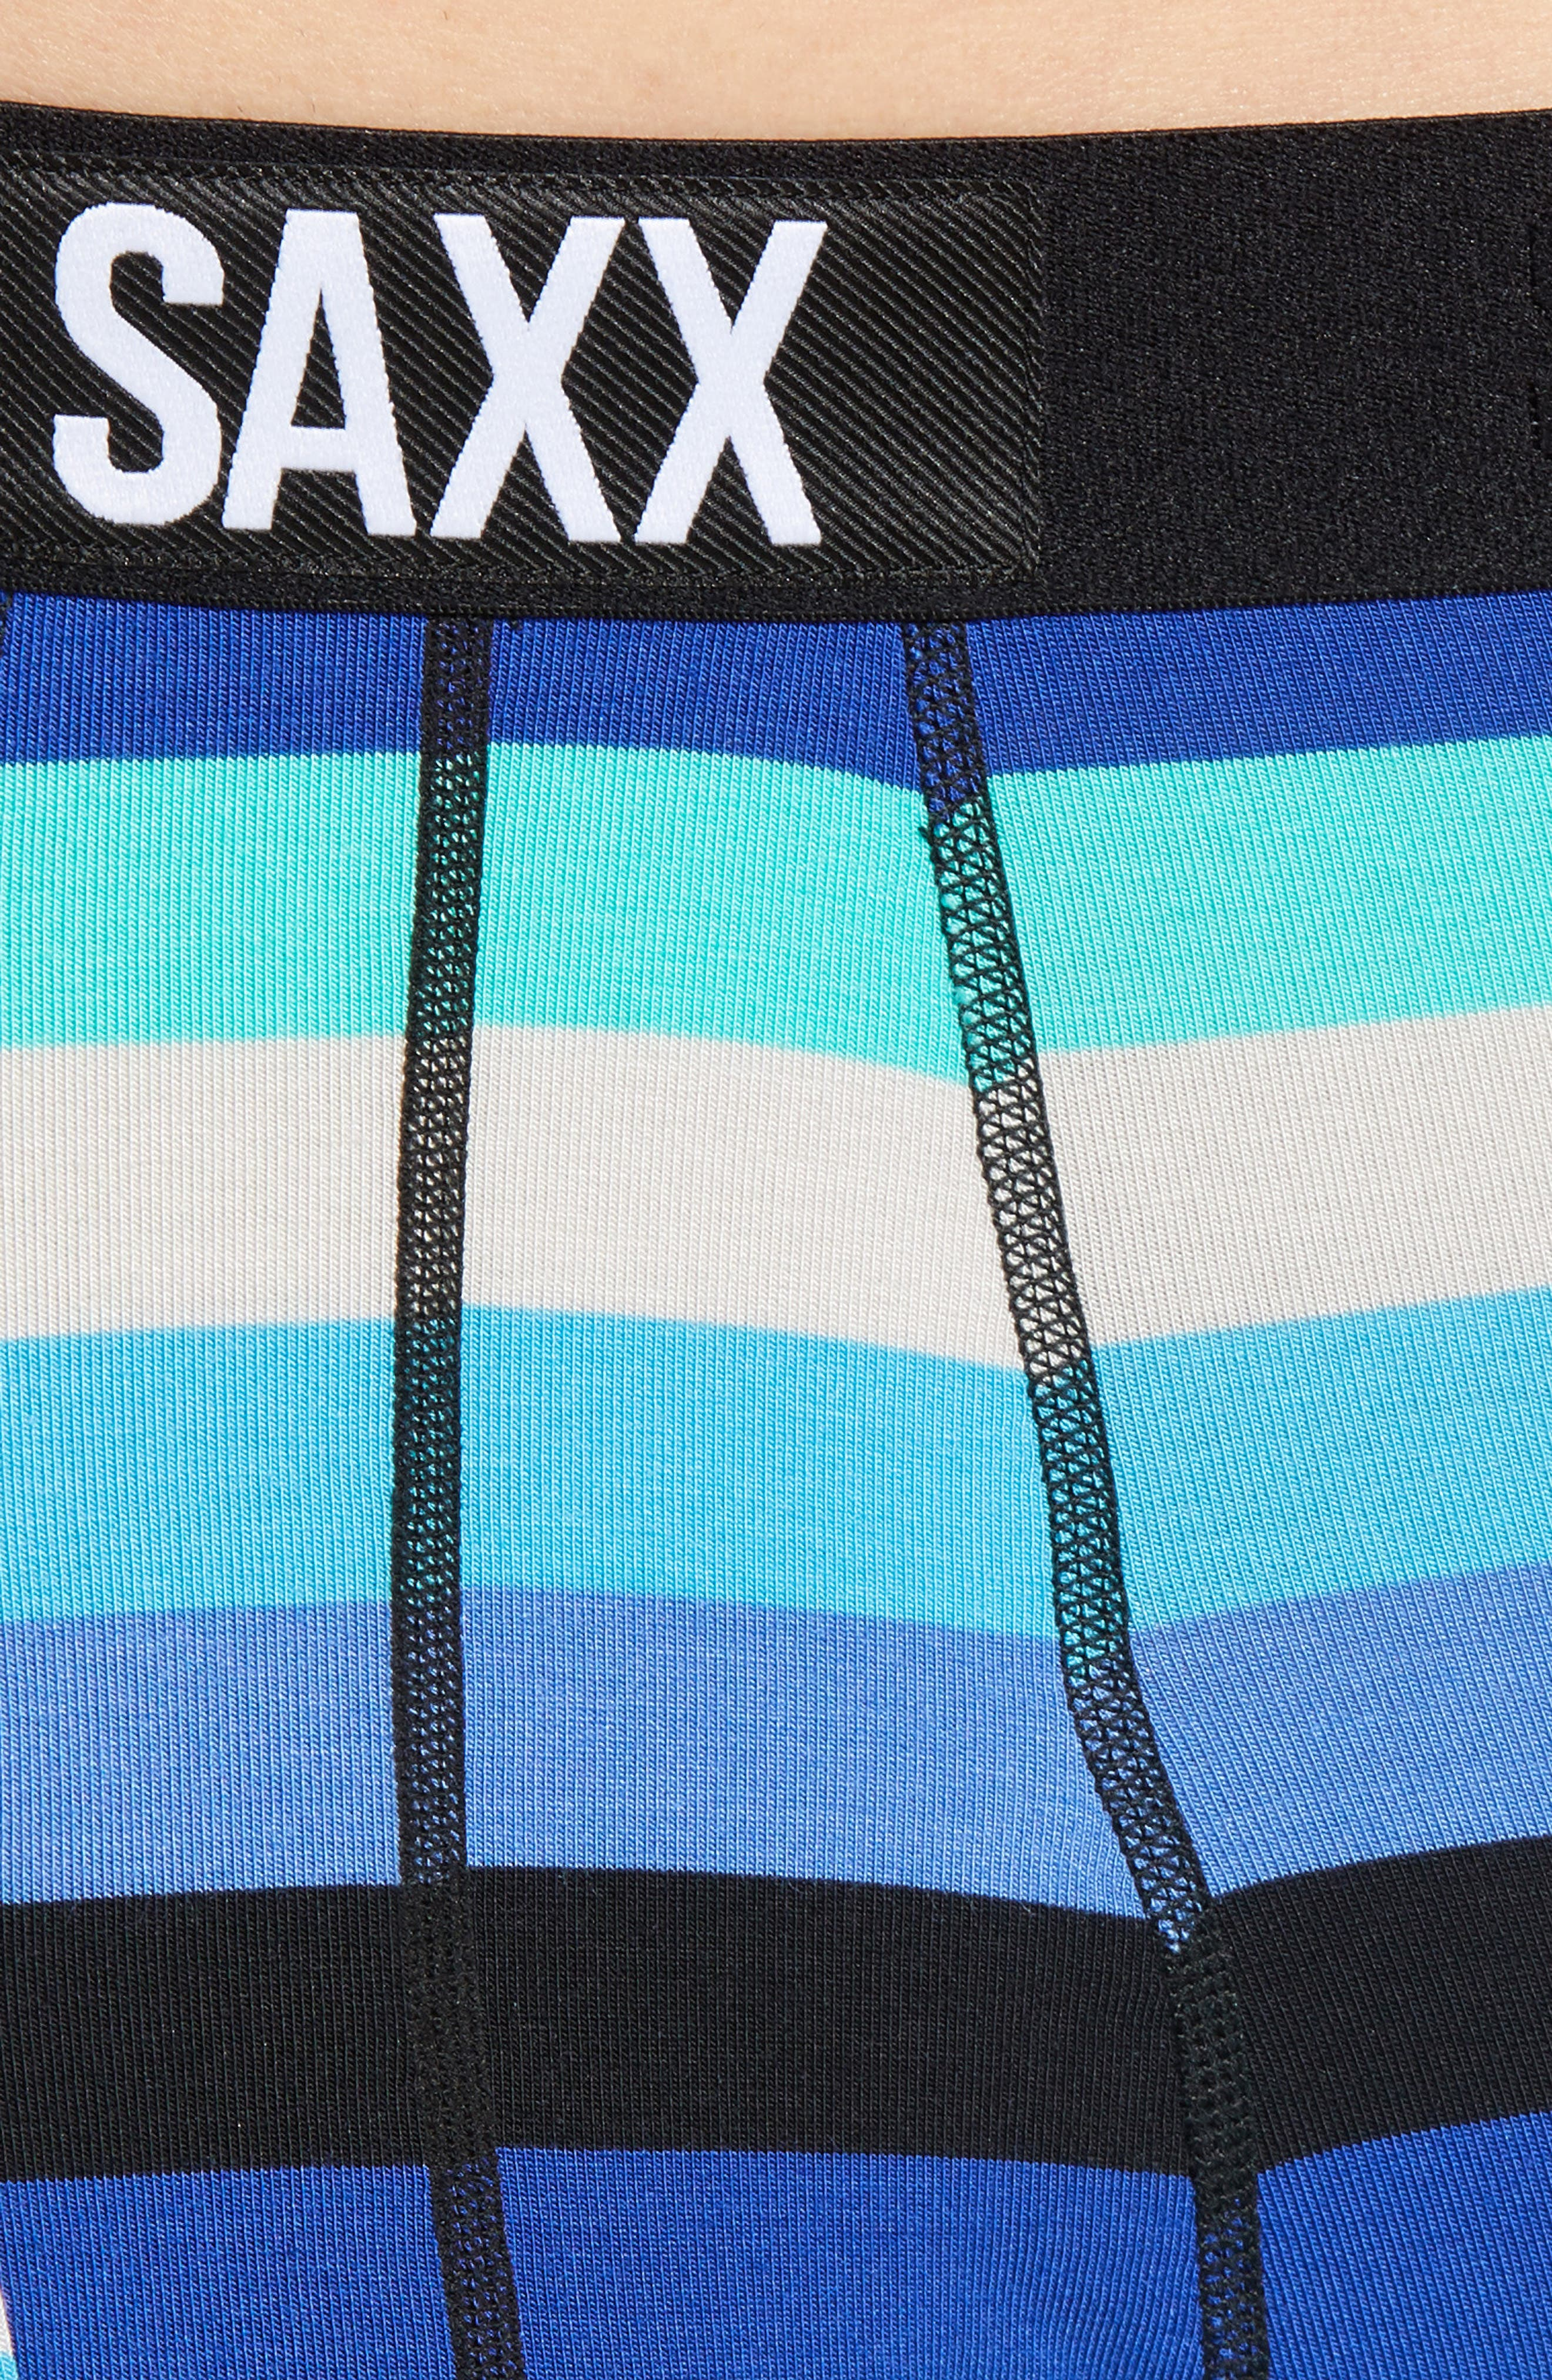 Ultra Cabana Stripe Stretch Boxer Briefs,                             Alternate thumbnail 4, color,                             BLUE CABANA STRIPE